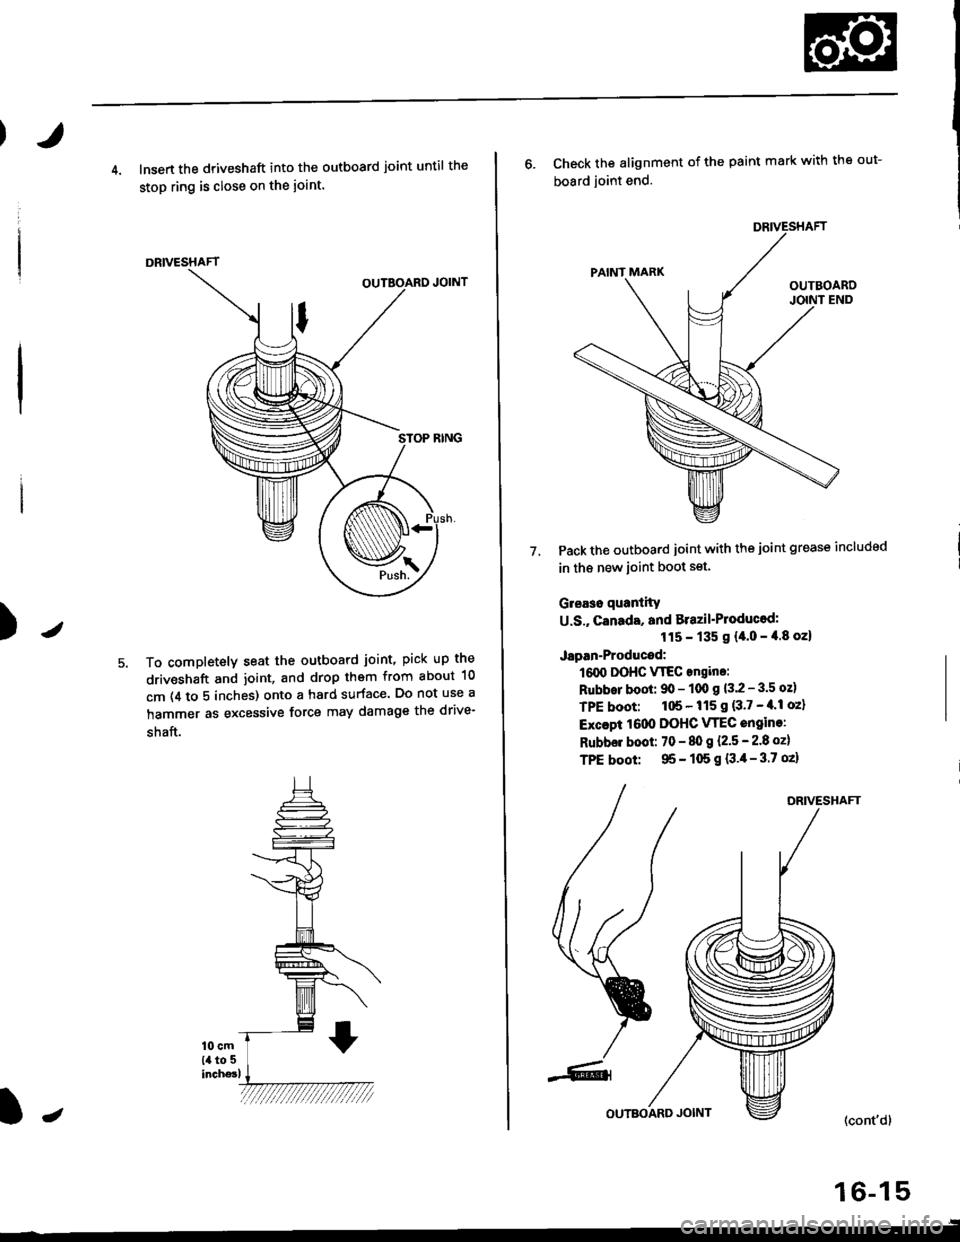 hight resolution of 93 geo tracker engine hoses diagram diagram data schema 93 geo tracker engine hoses diagram